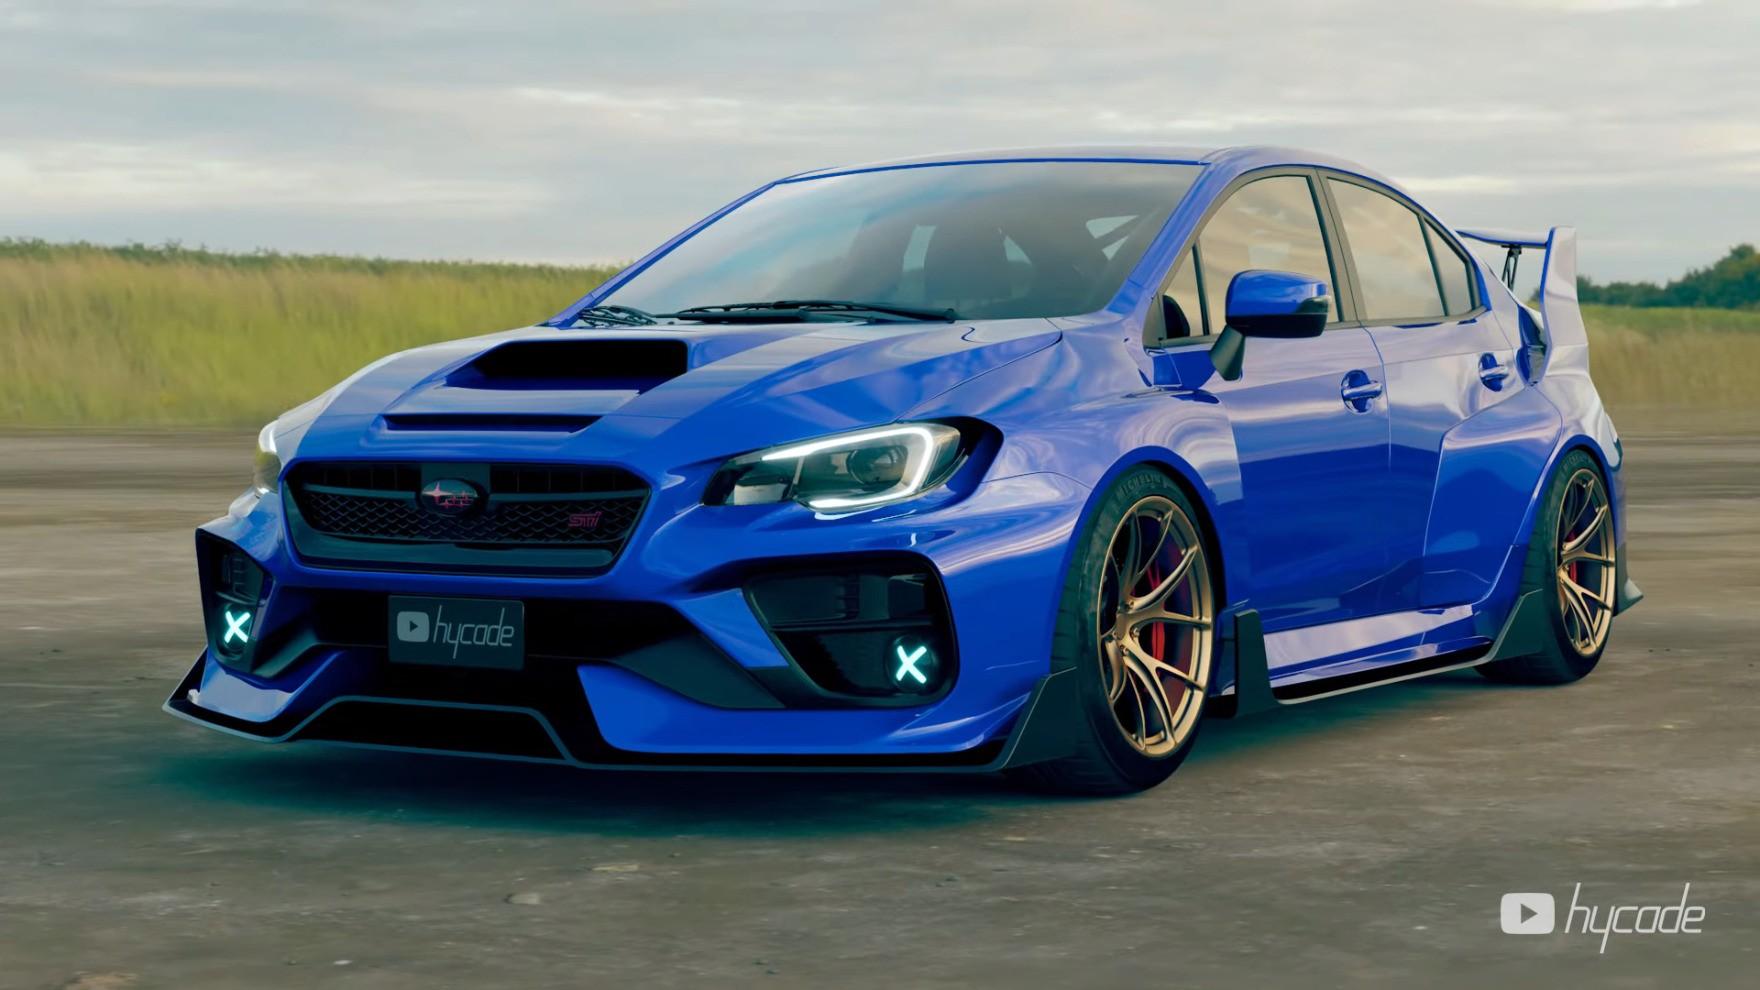 Subaru Wrx Sti Muscle Mass Widebody Is The Best Digital Jdm Tuning Autoevolution